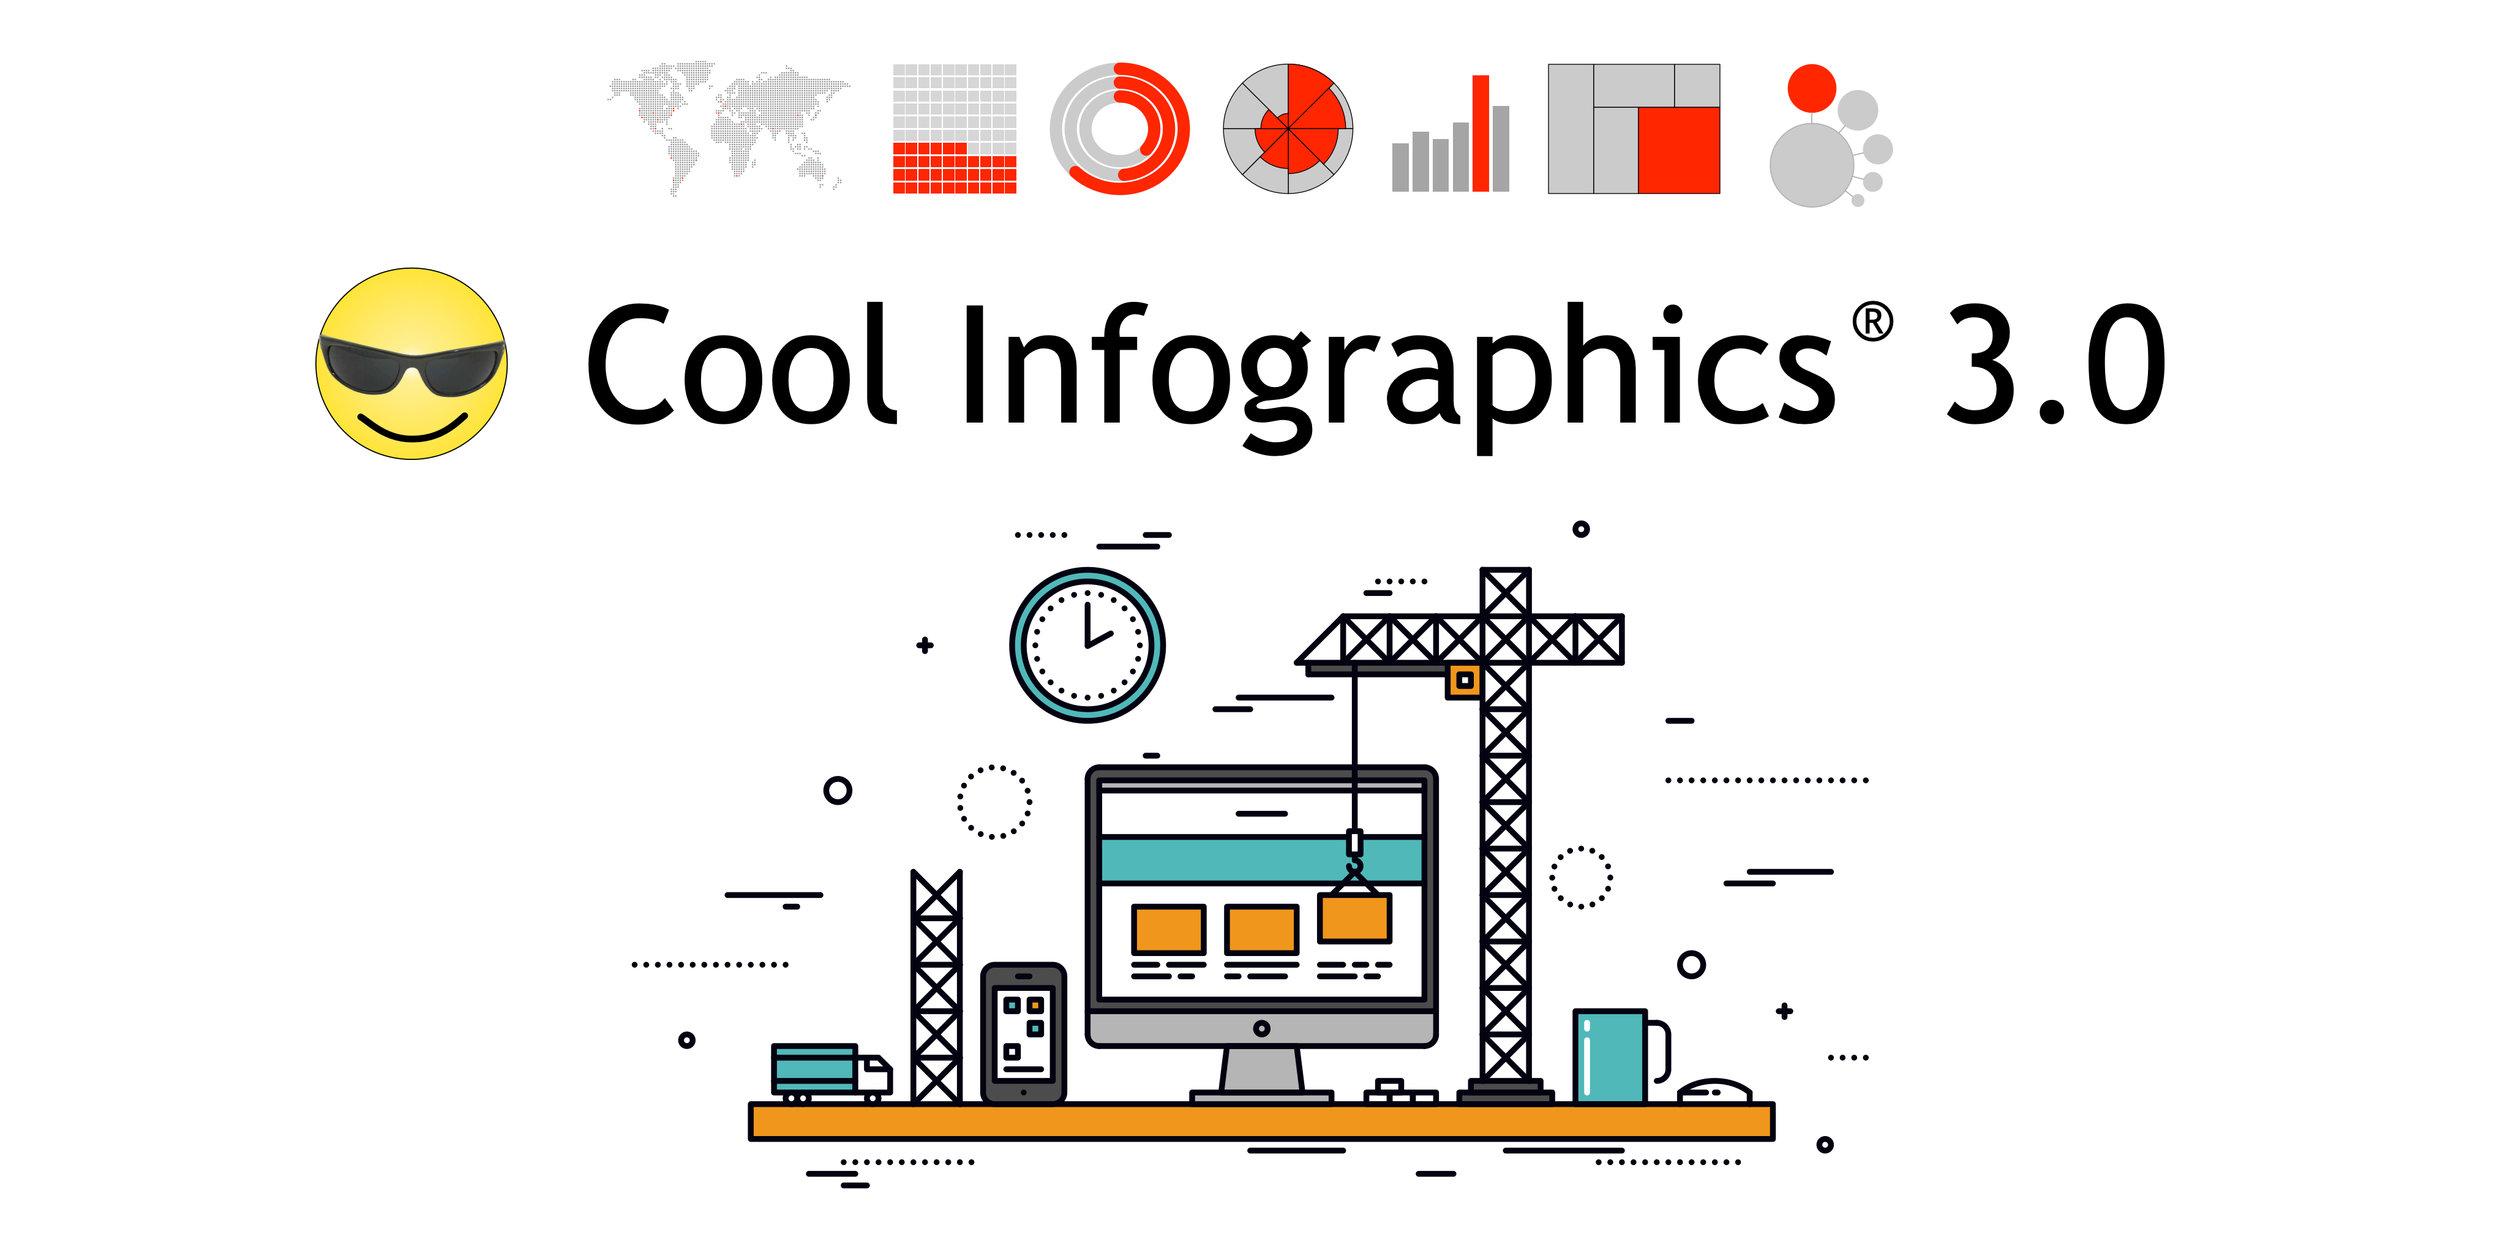 Cool Infographics 3.0 Website Redesign